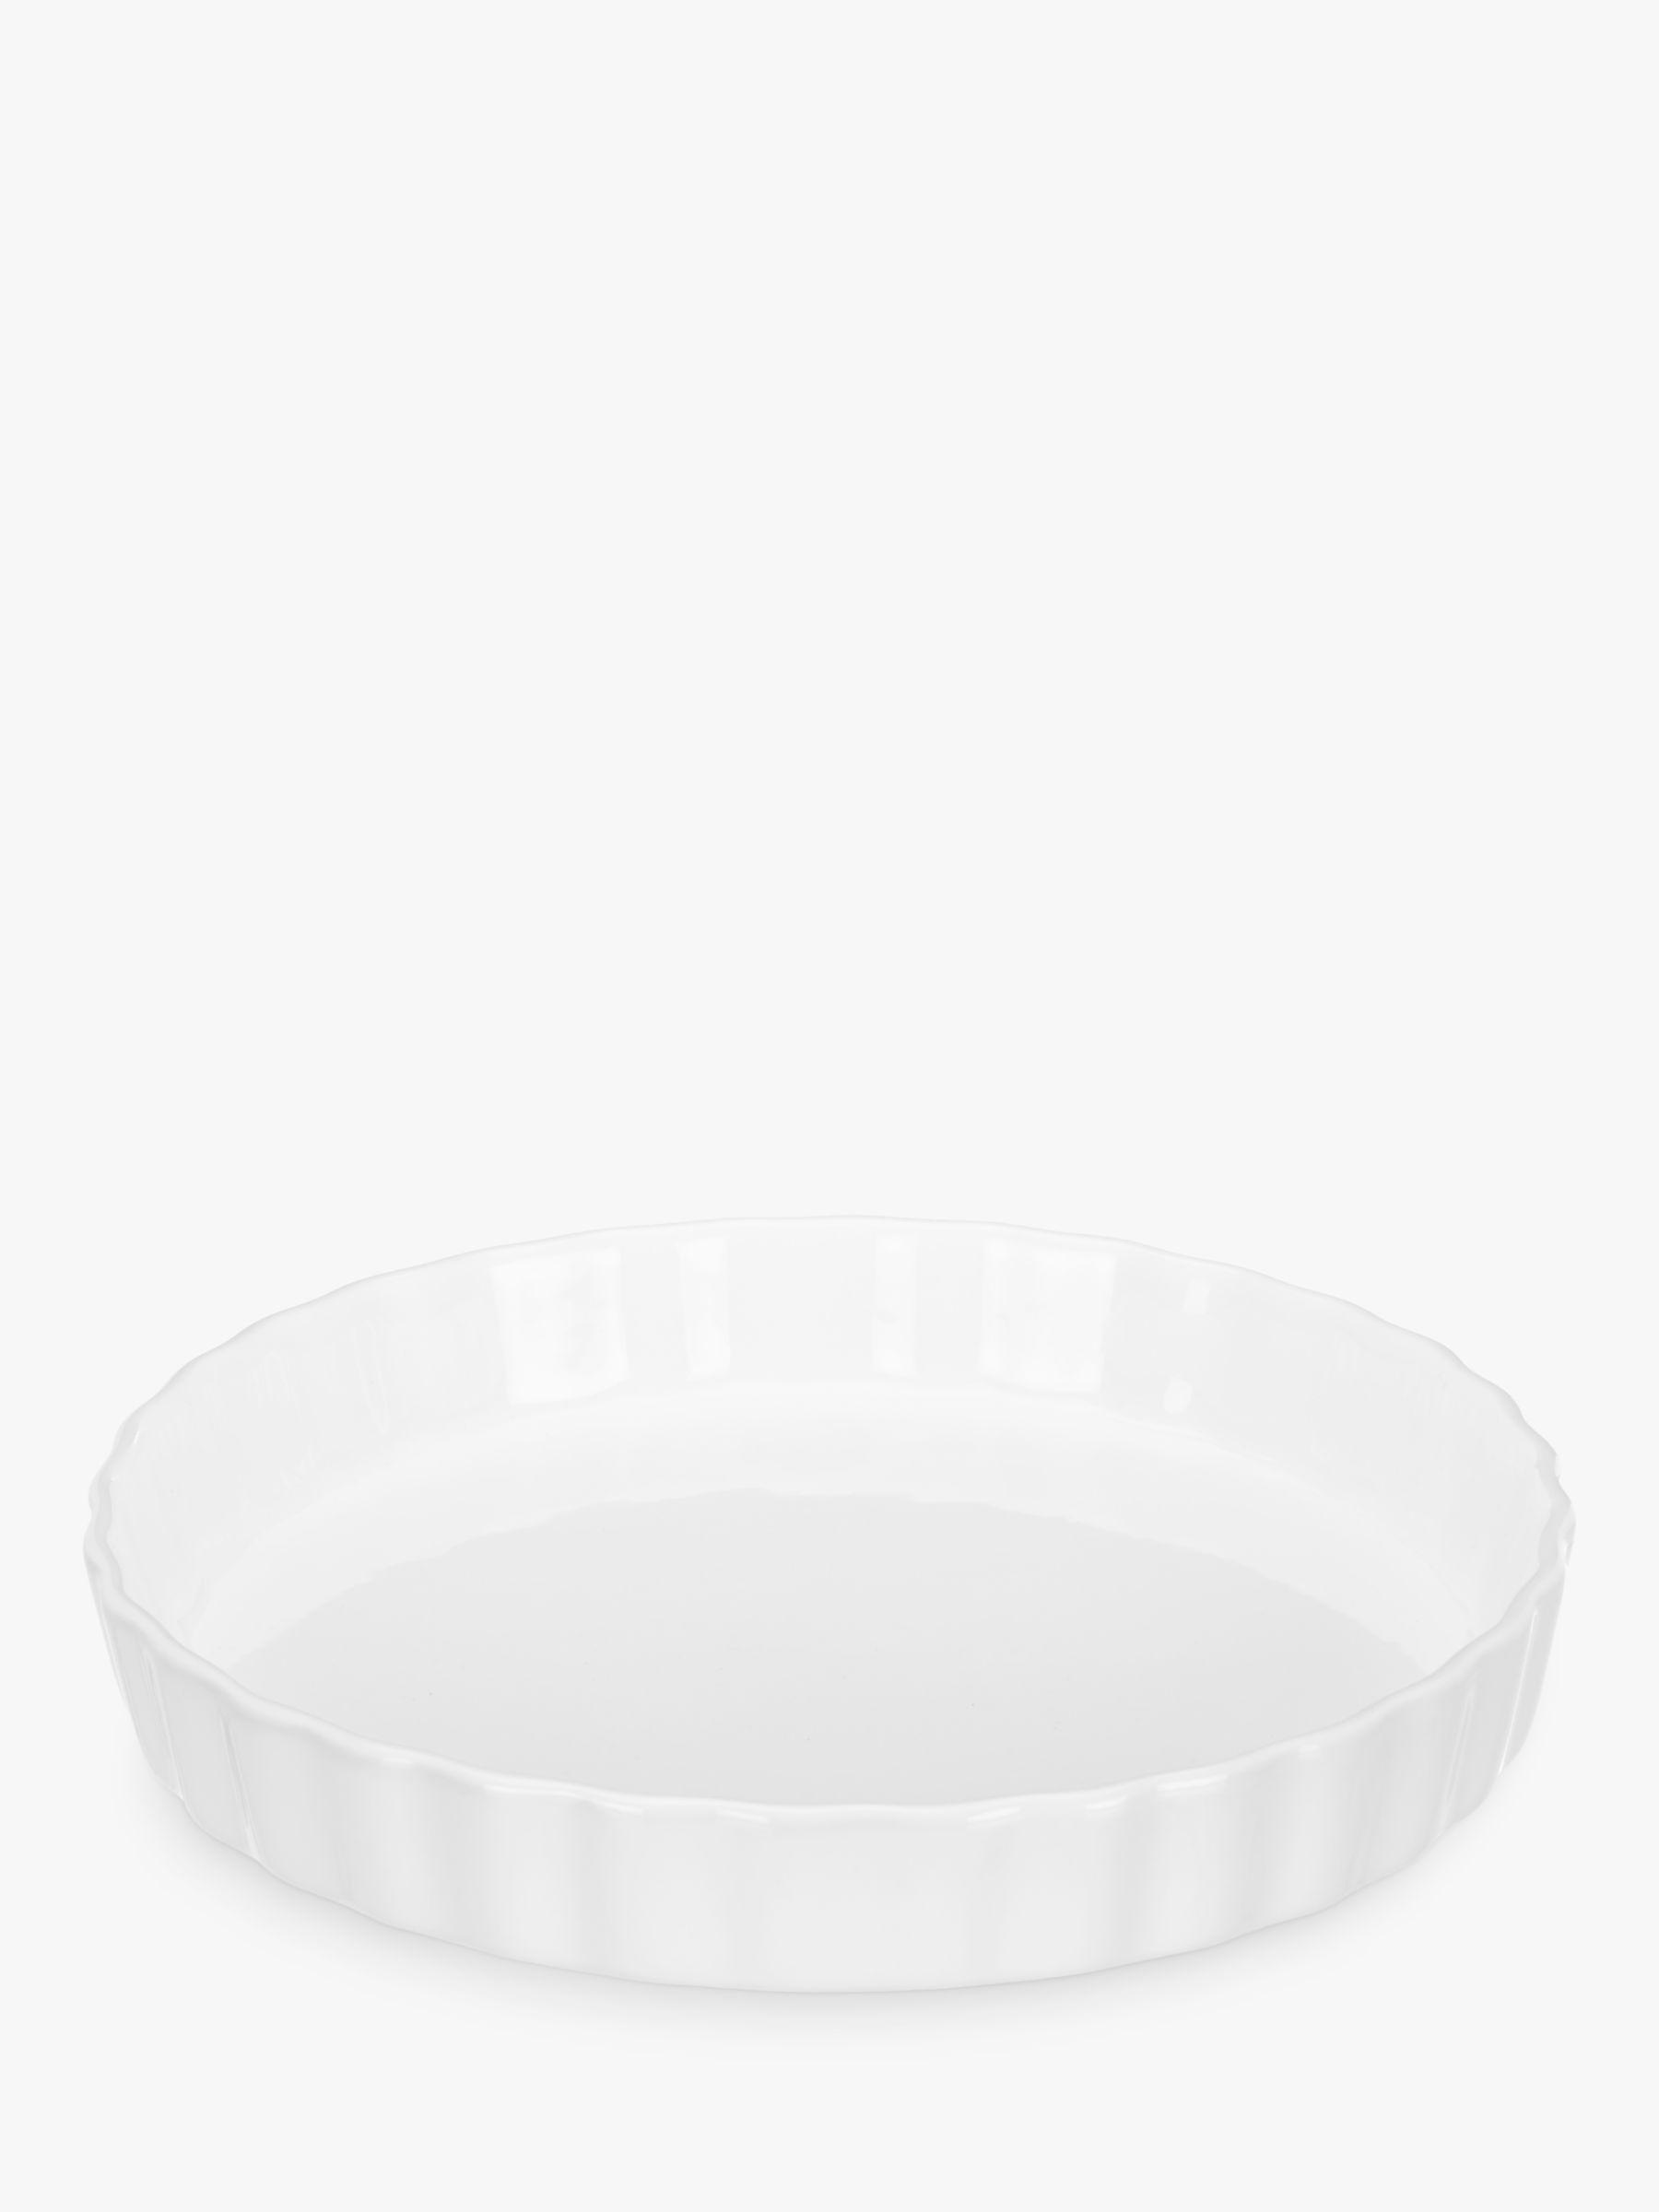 John Lewis Porcelain Round Flan Oven Dish 26cm Octer